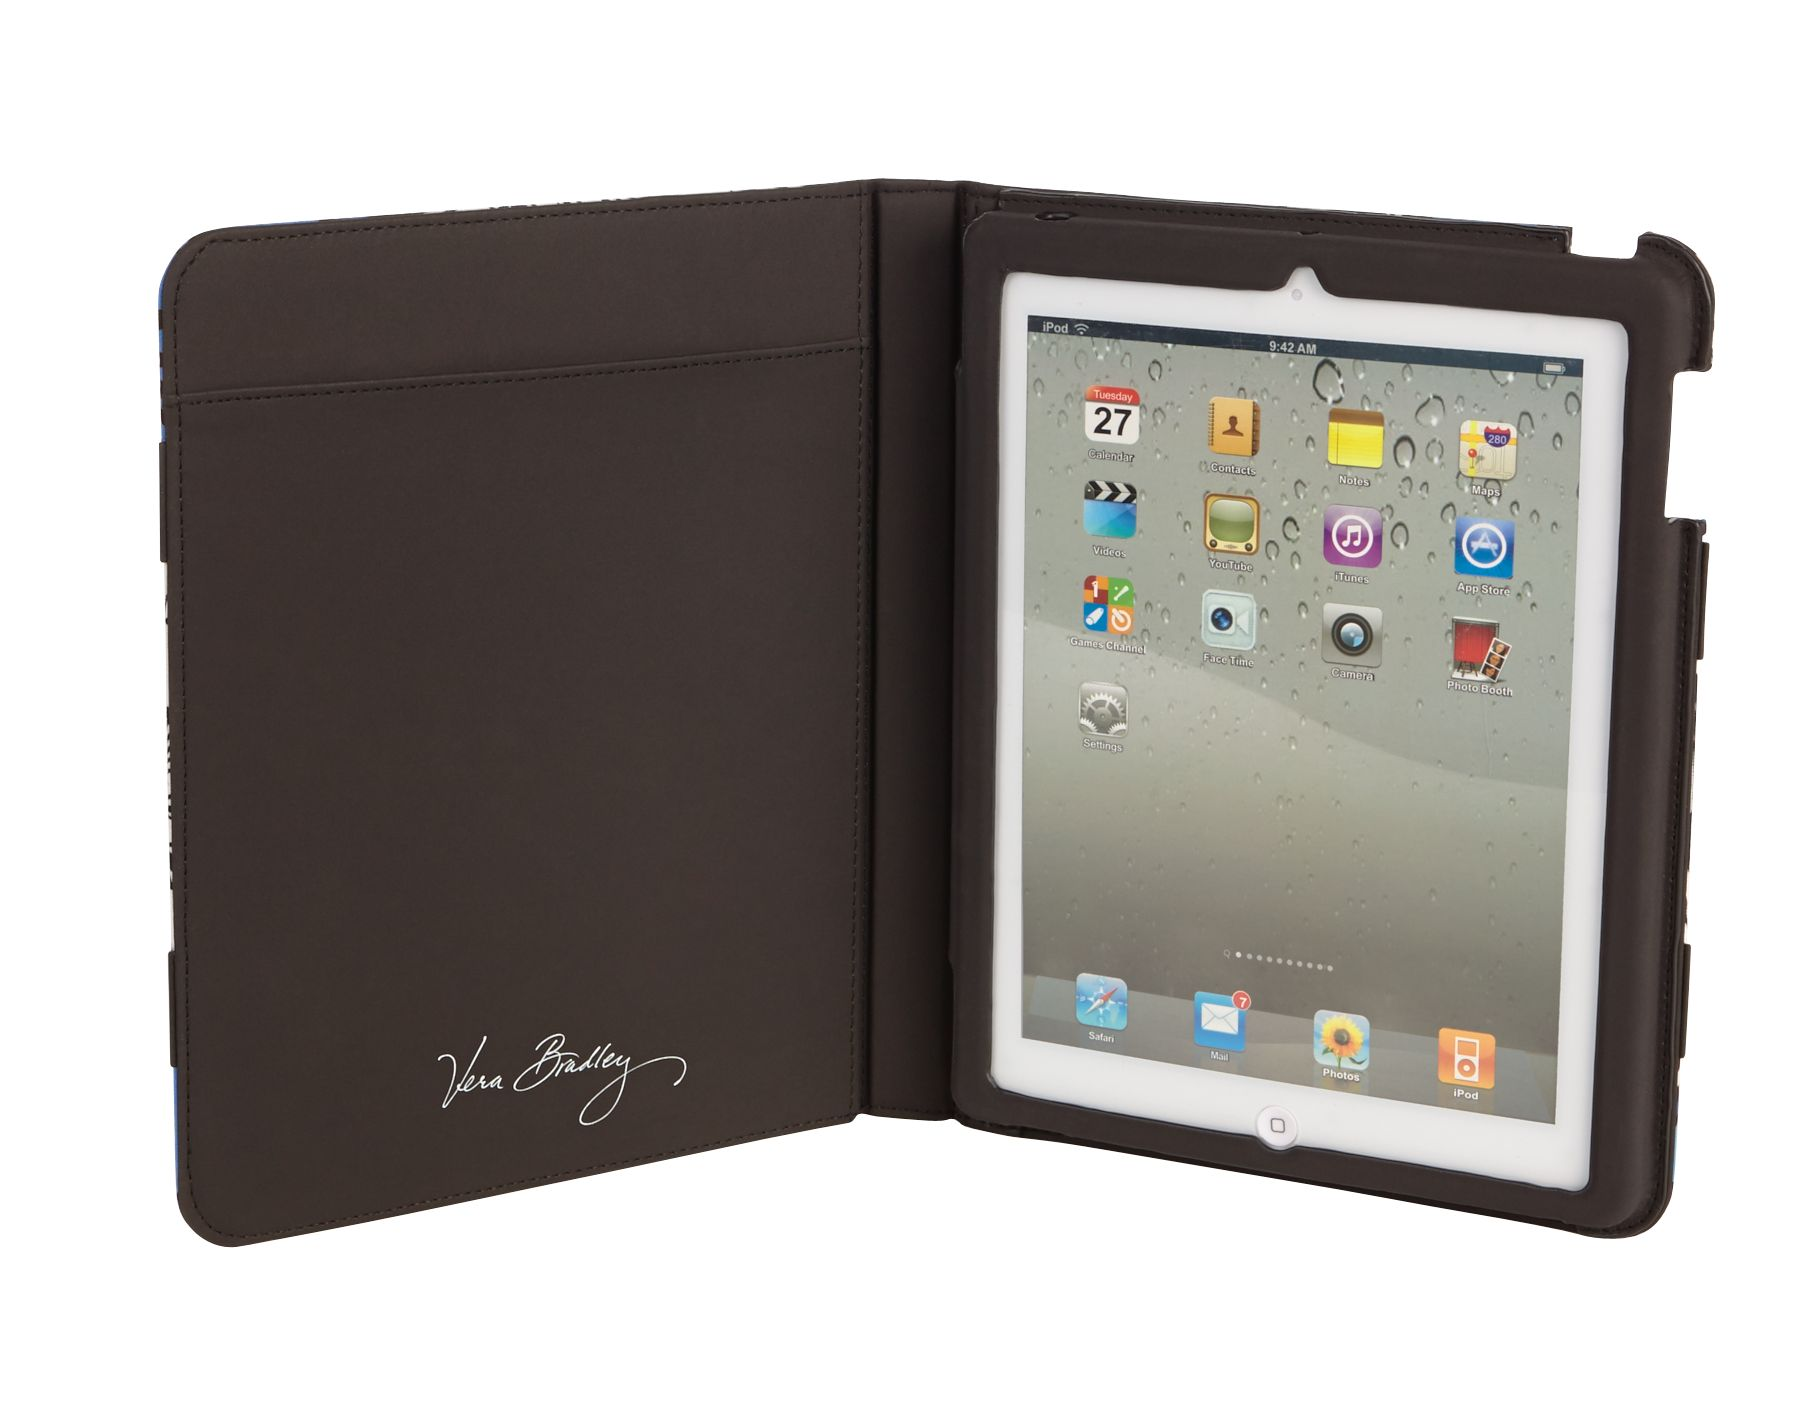 Vera Bradley Tablet Folio